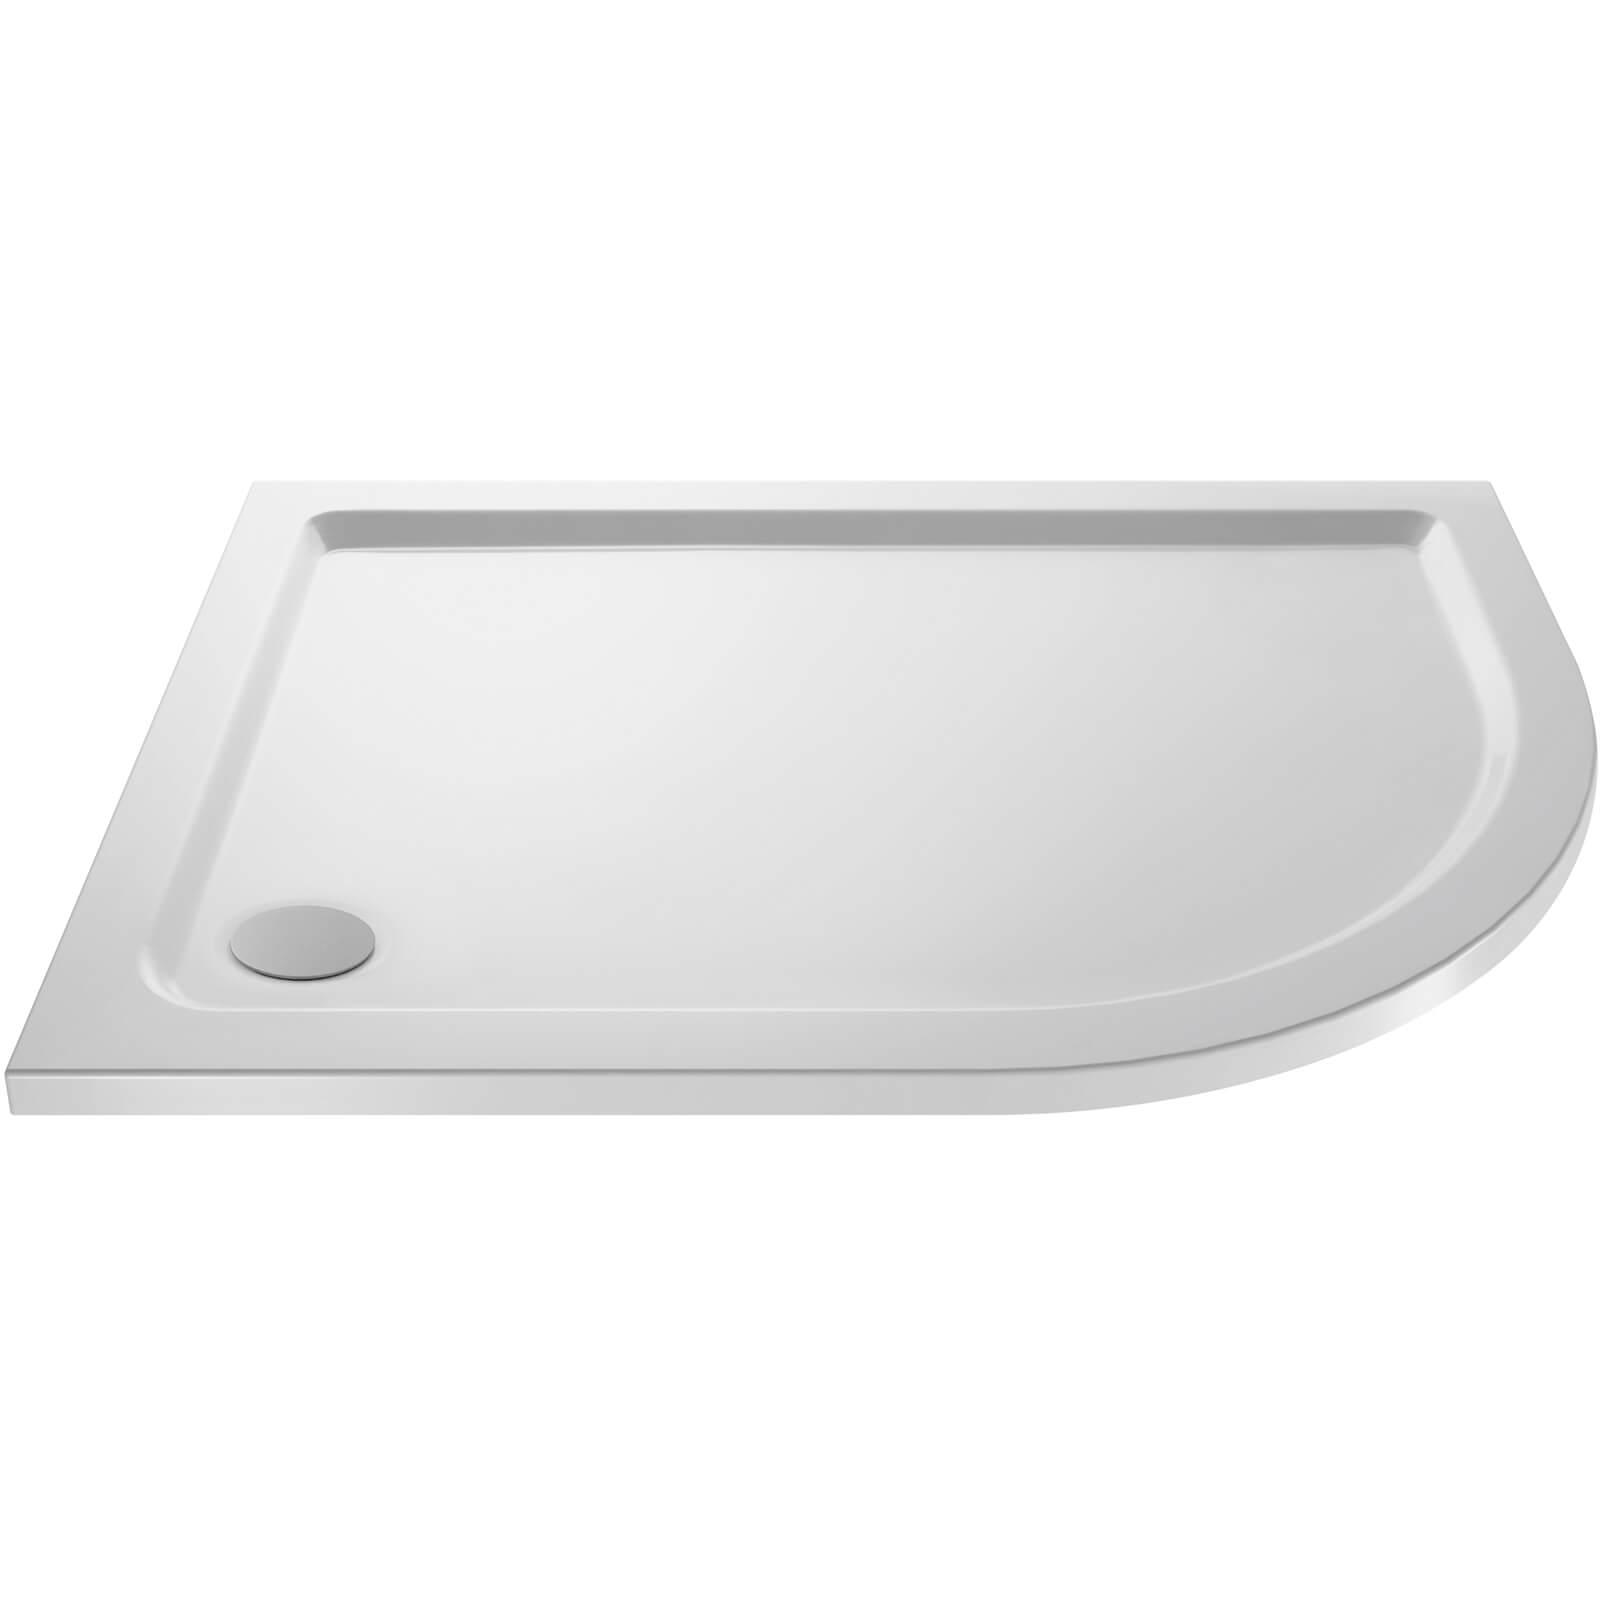 Balterley Right Hand Offset Quadrant Shower Tray - 1200 x 800mm